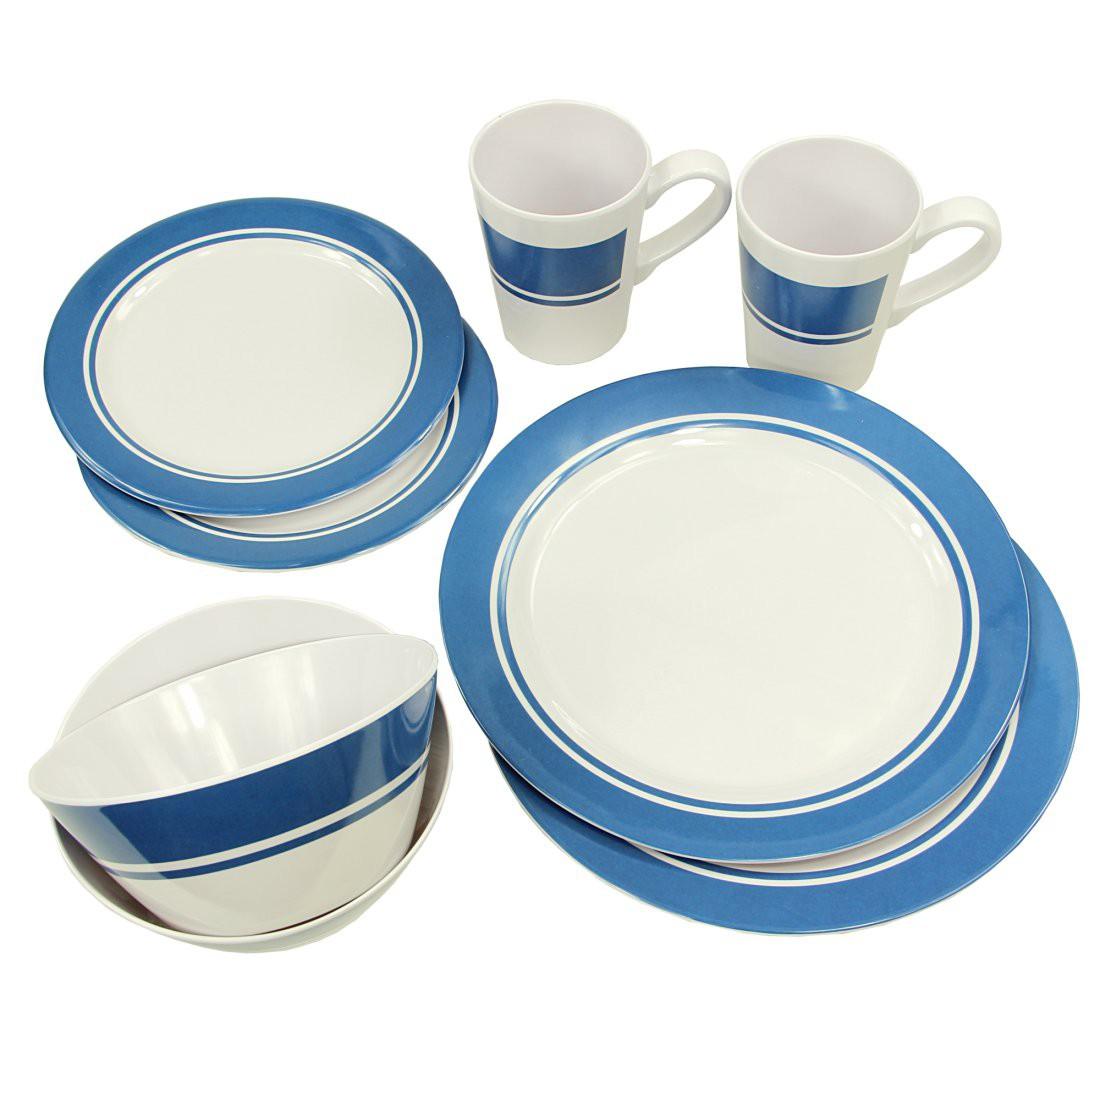 Buy Fridani MDD Dinnerware - 8 piece melamine crockery, 2 cups, 4 ...